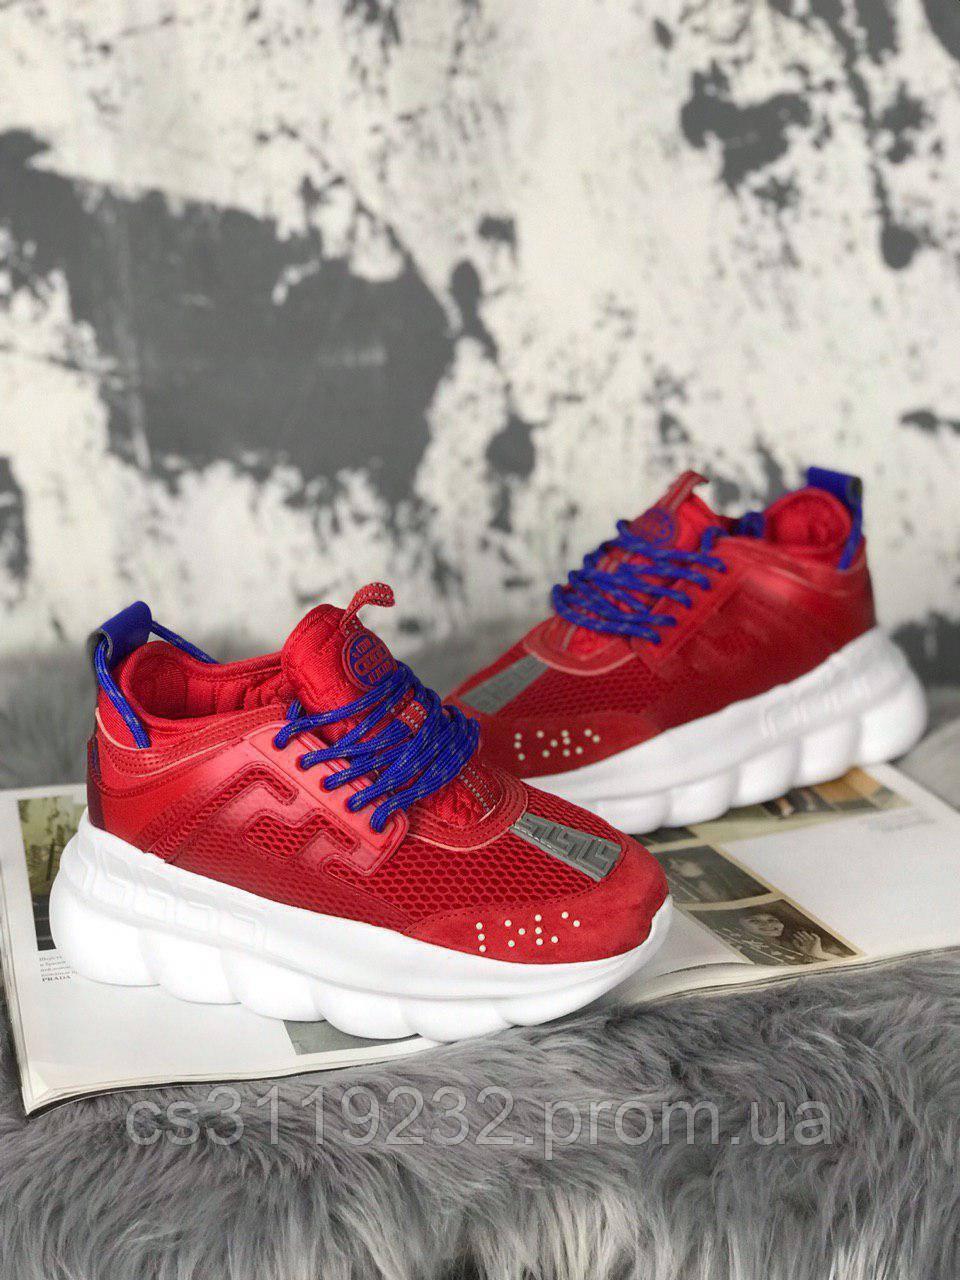 Женские кроссовки Versace Chain Reaction Red White (красные)